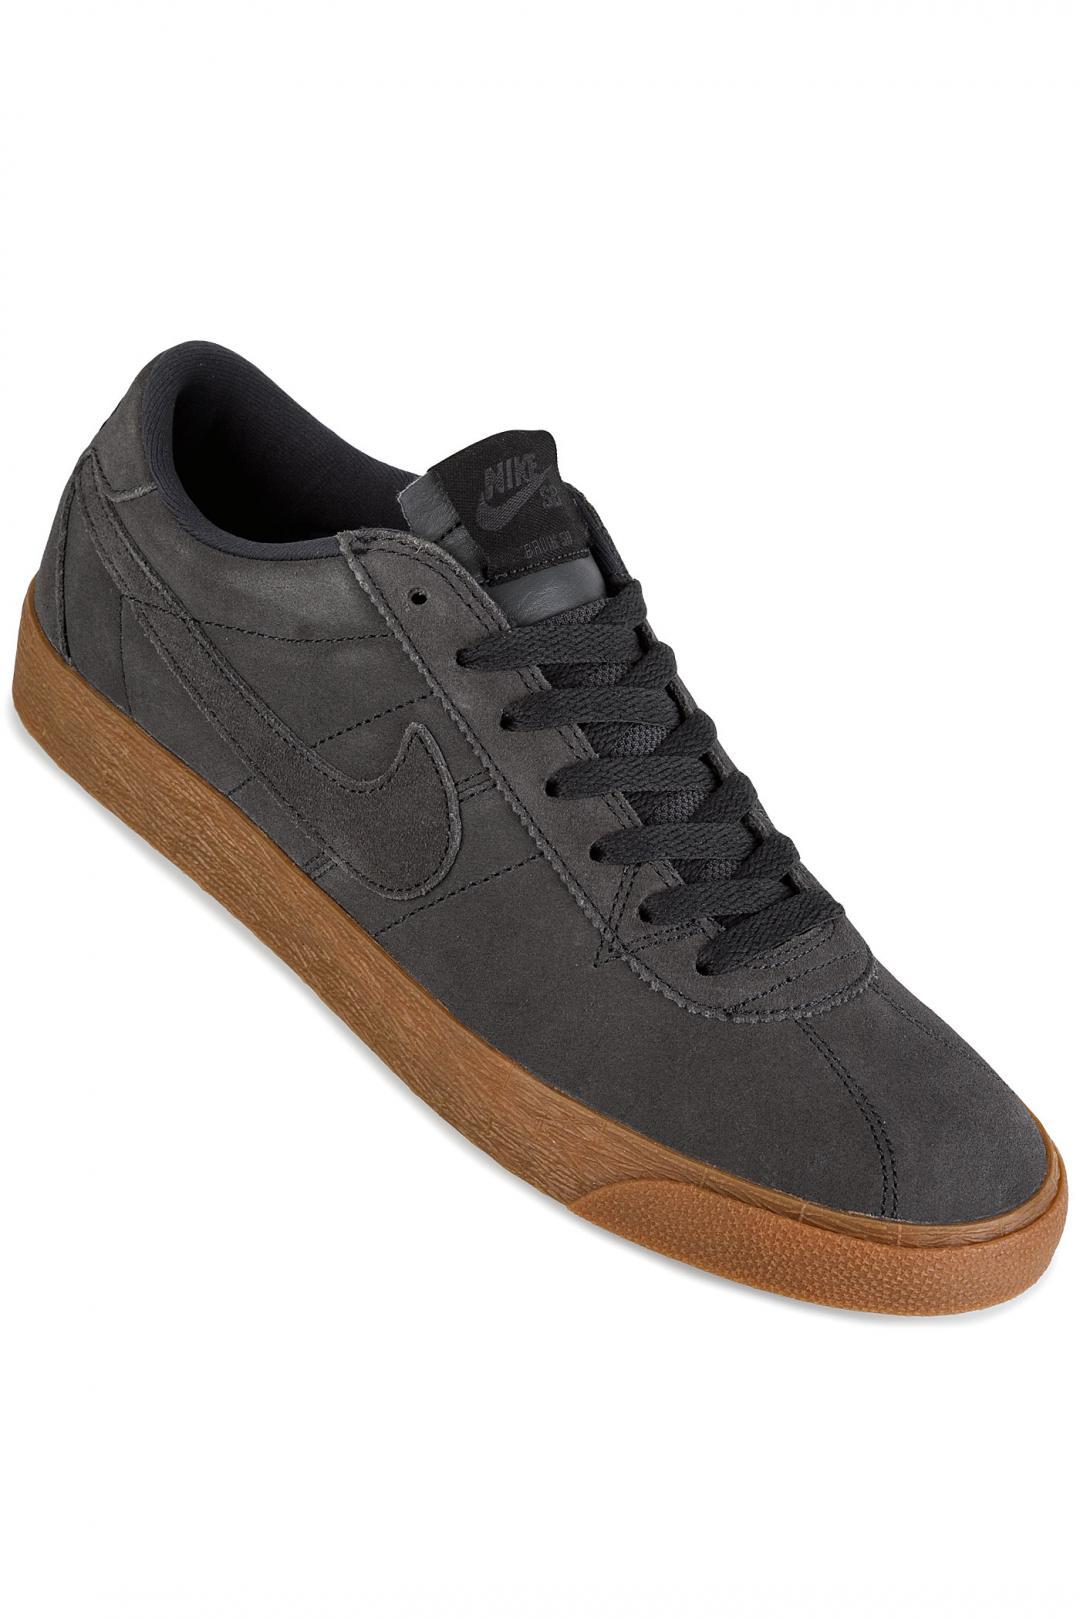 Uomo Nike SB Zoom Bruin anthracite black | Sneakers low top